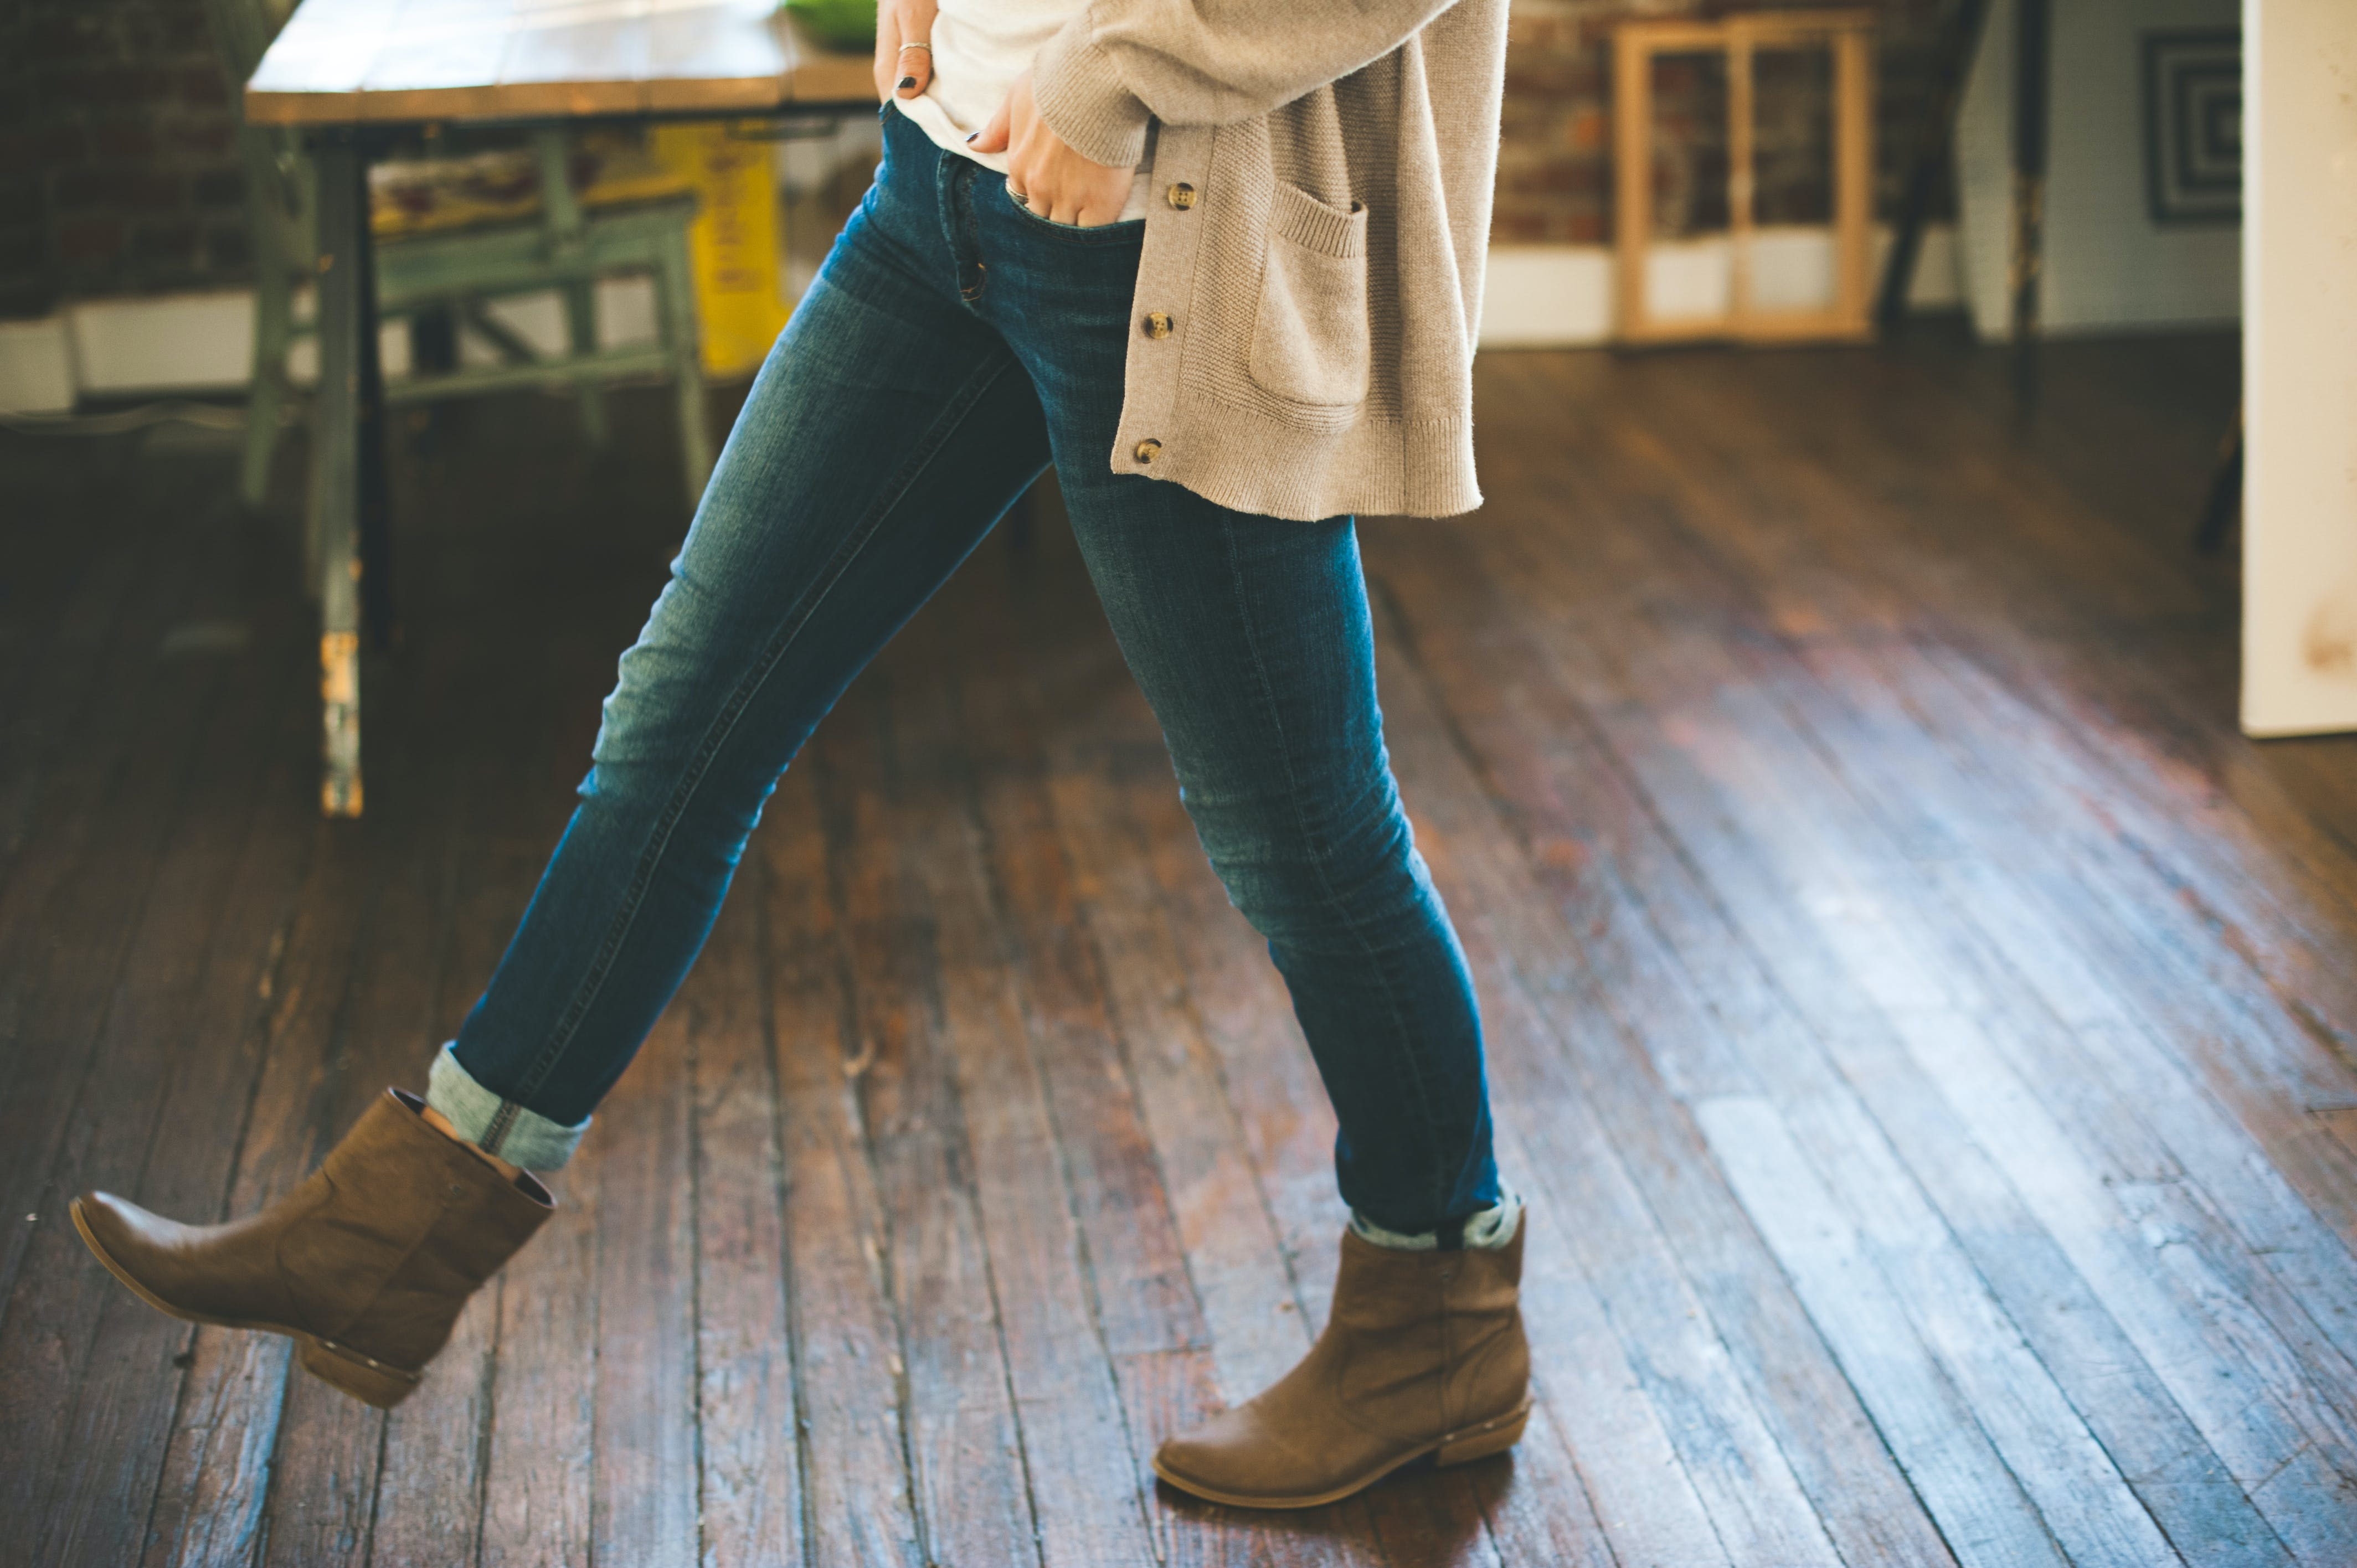 Woman Walking on Brown Parquet Floor